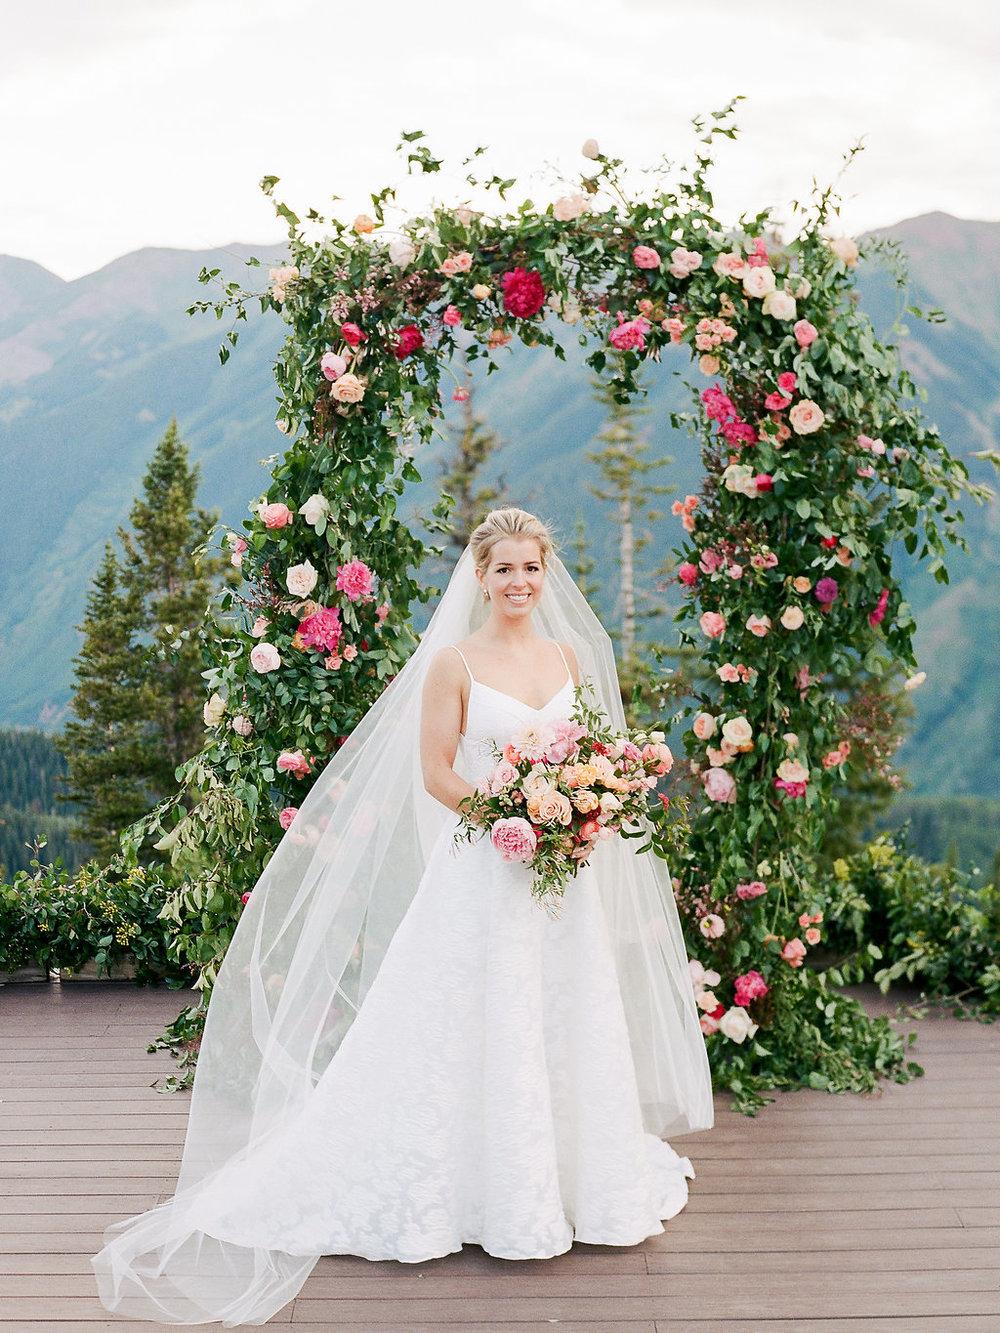 letty-scott-wedding-bride-groom-67.jpg